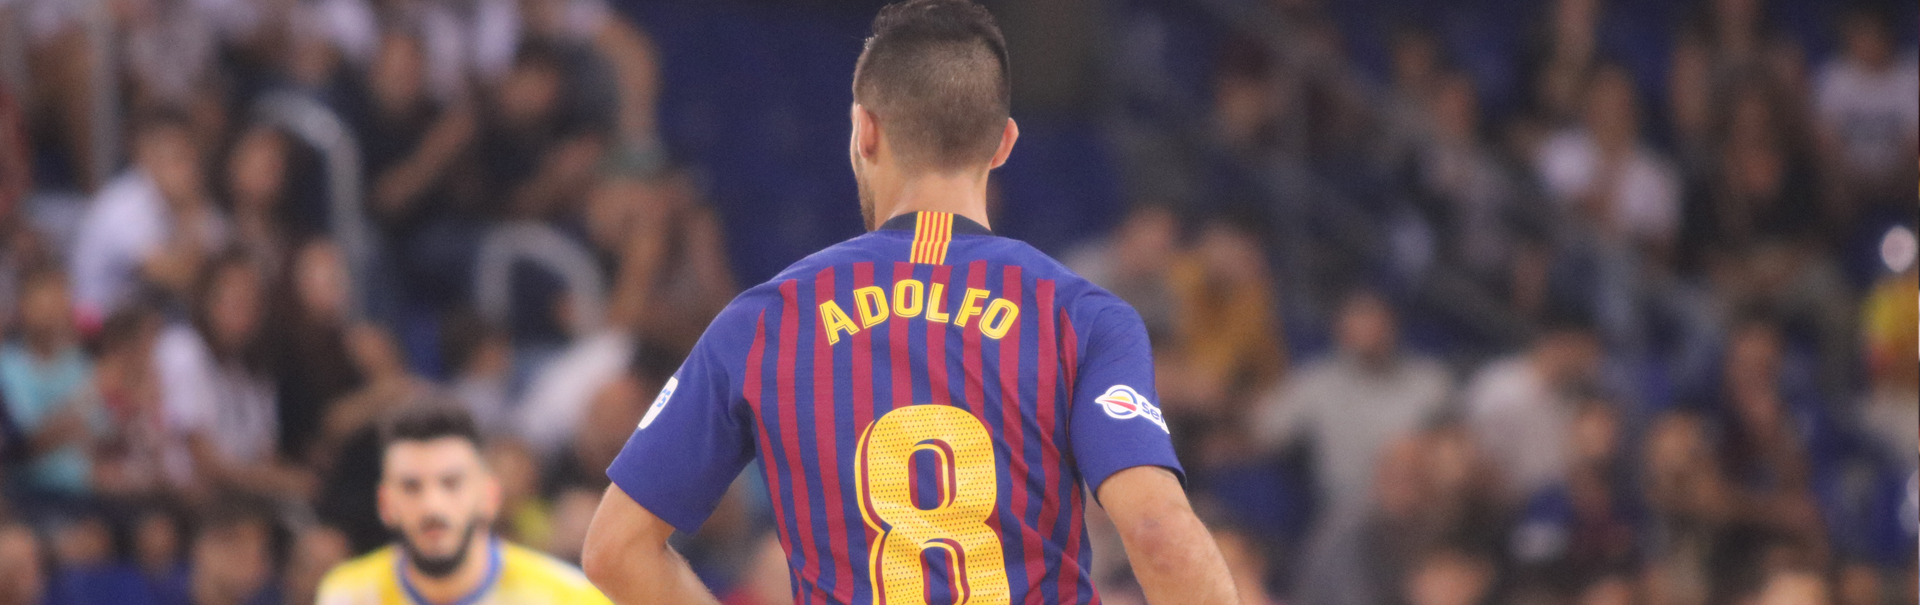 Adolfo - Proneo Sports